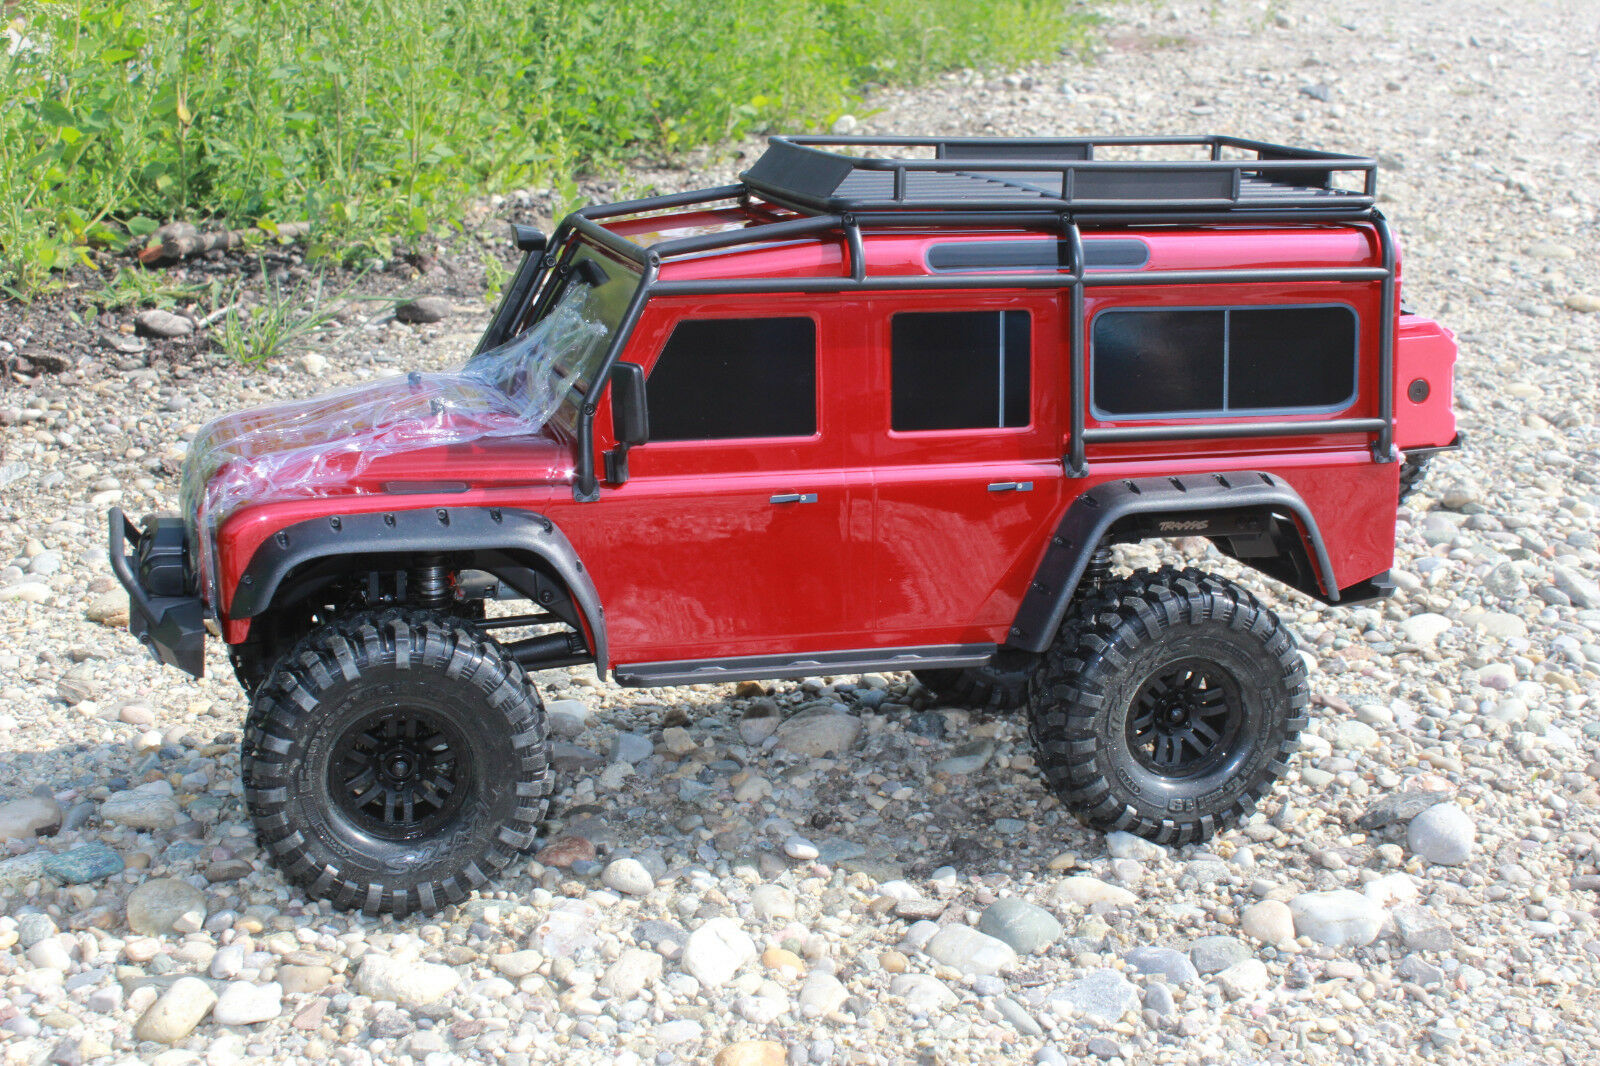 TRAXXAS 82056-4 trx-4 ROSSO Crawler Land Rover Defender 1 10 RTR